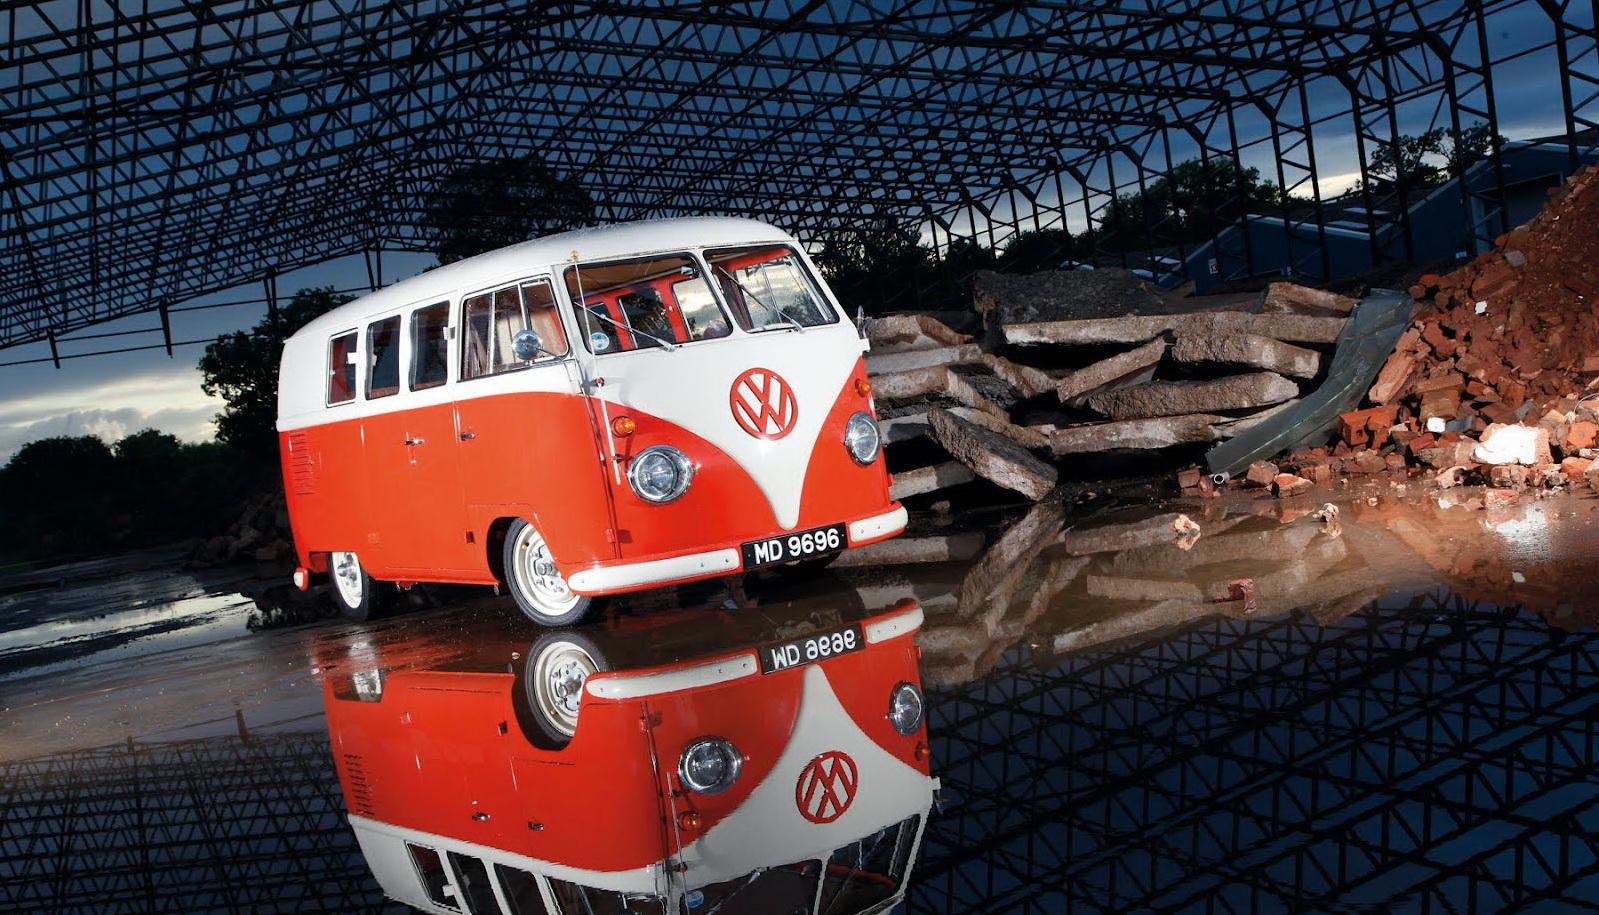 Classic VW Bus Wallpaper Desktop 10272 Wallpaper WallpaperLepi 1599x915